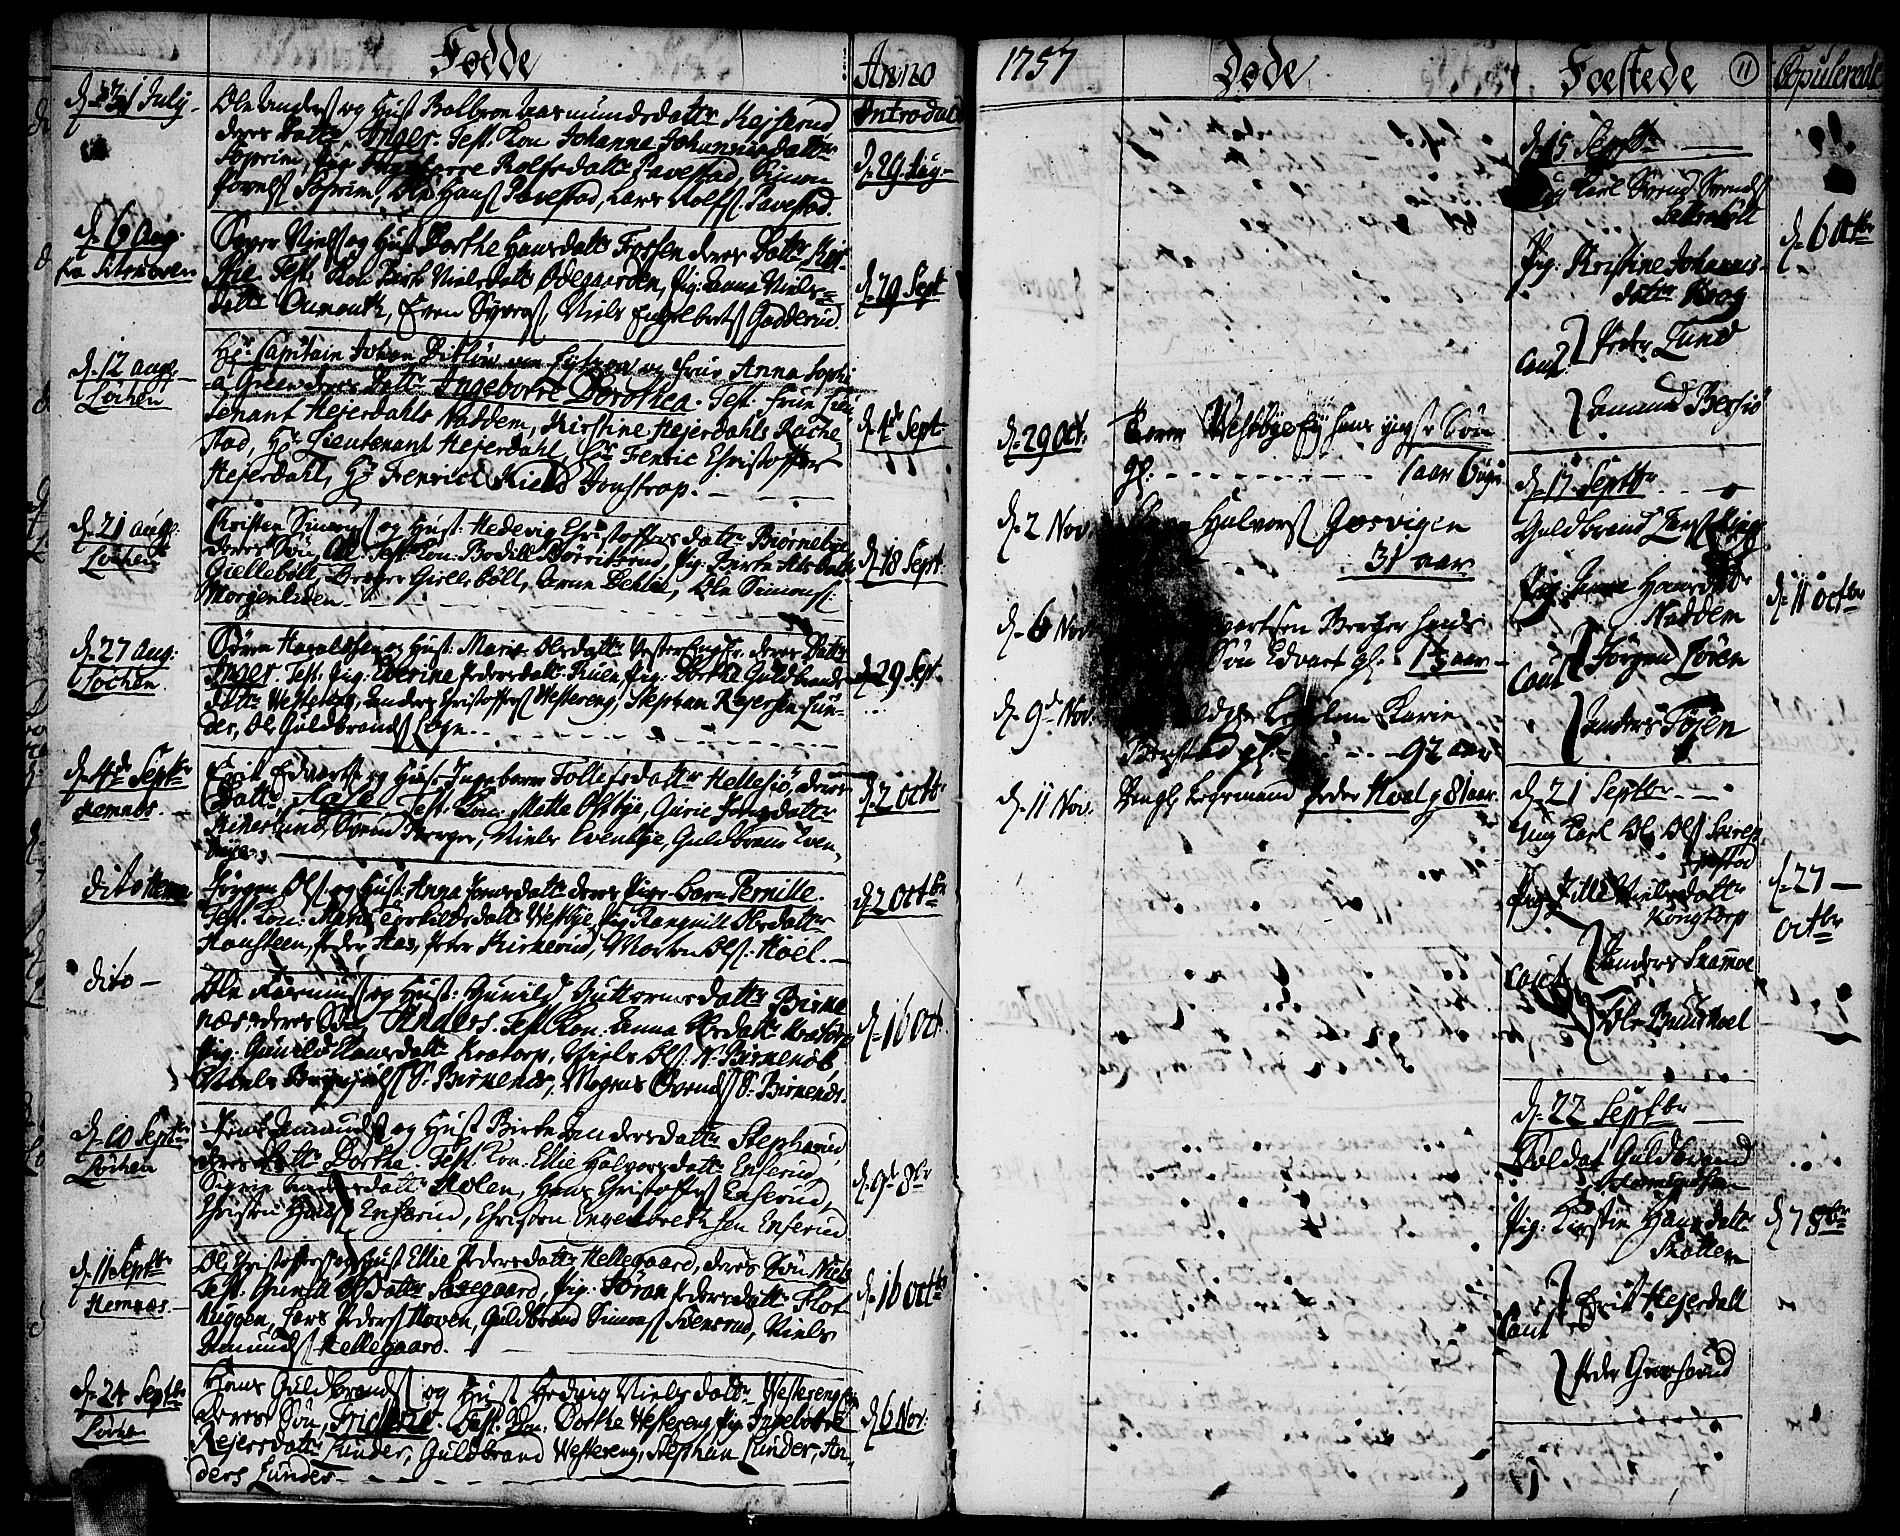 SAO, Høland prestekontor Kirkebøker, F/Fa/L0004: Ministerialbok nr. I 4, 1757-1780, s. 11